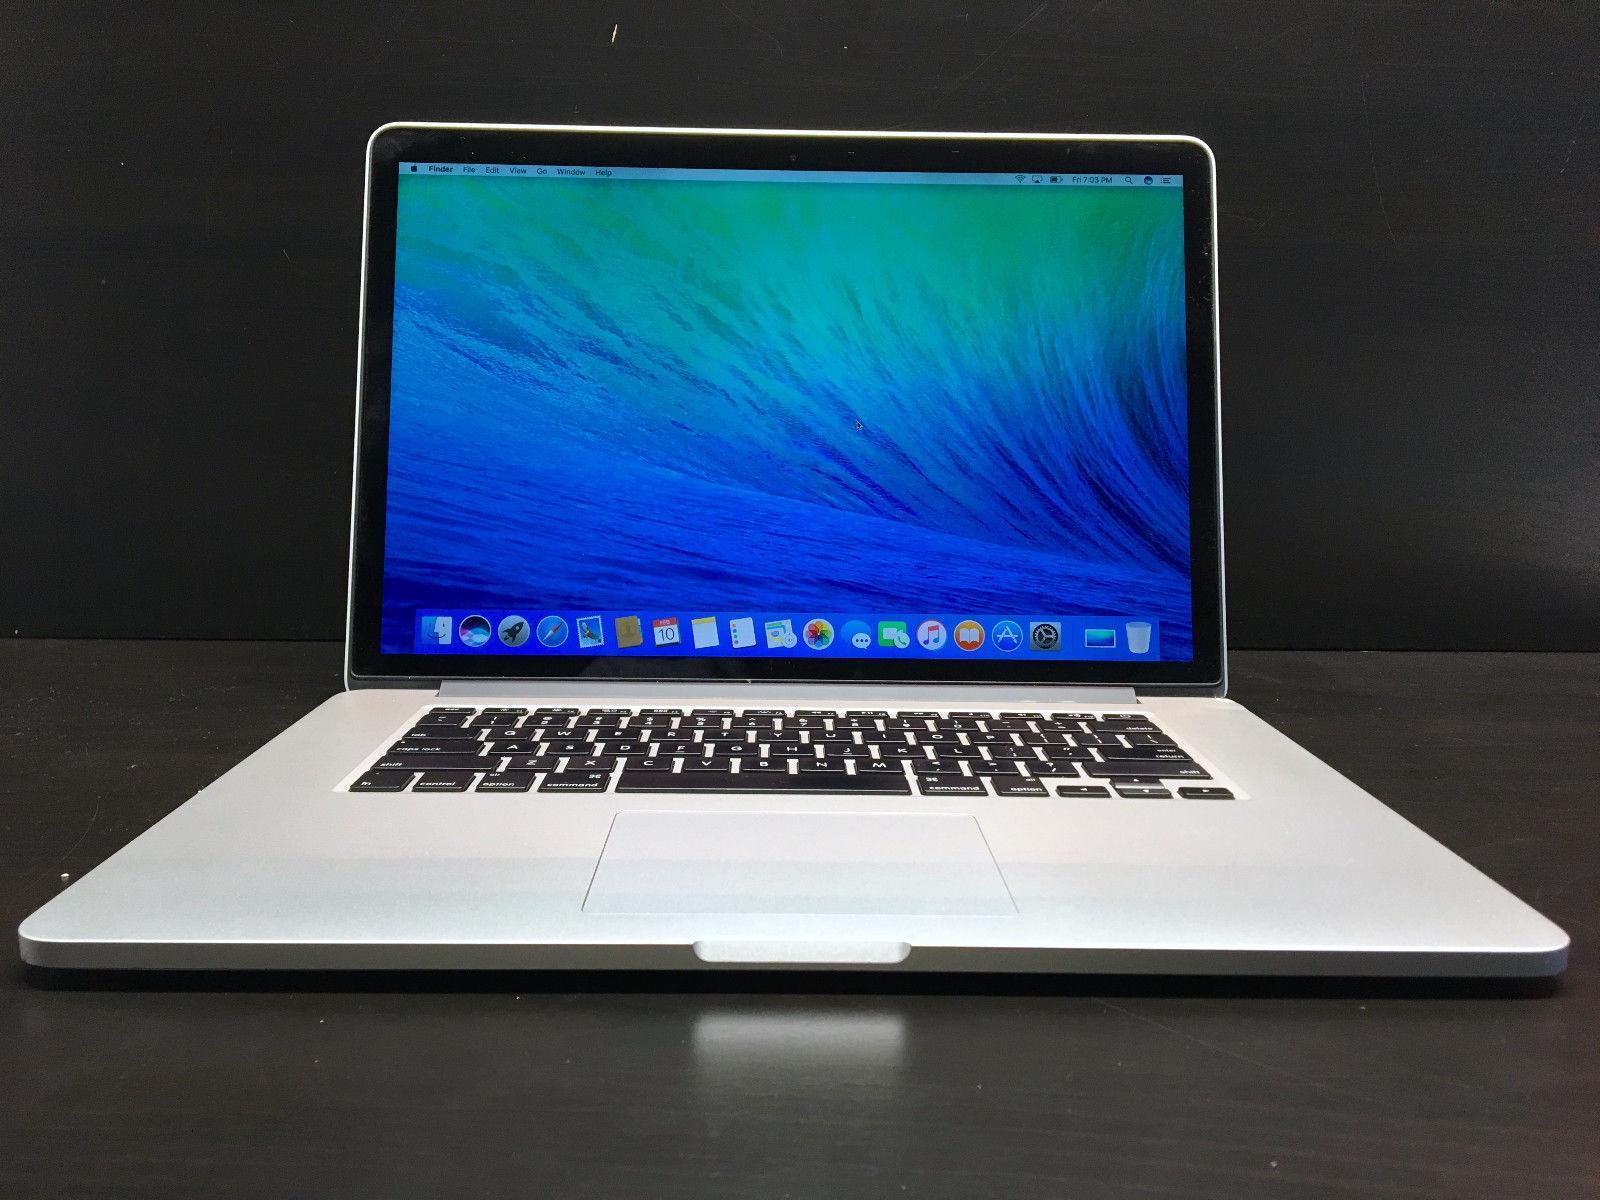 ban macbook pro retina a1398 2013 15 inch